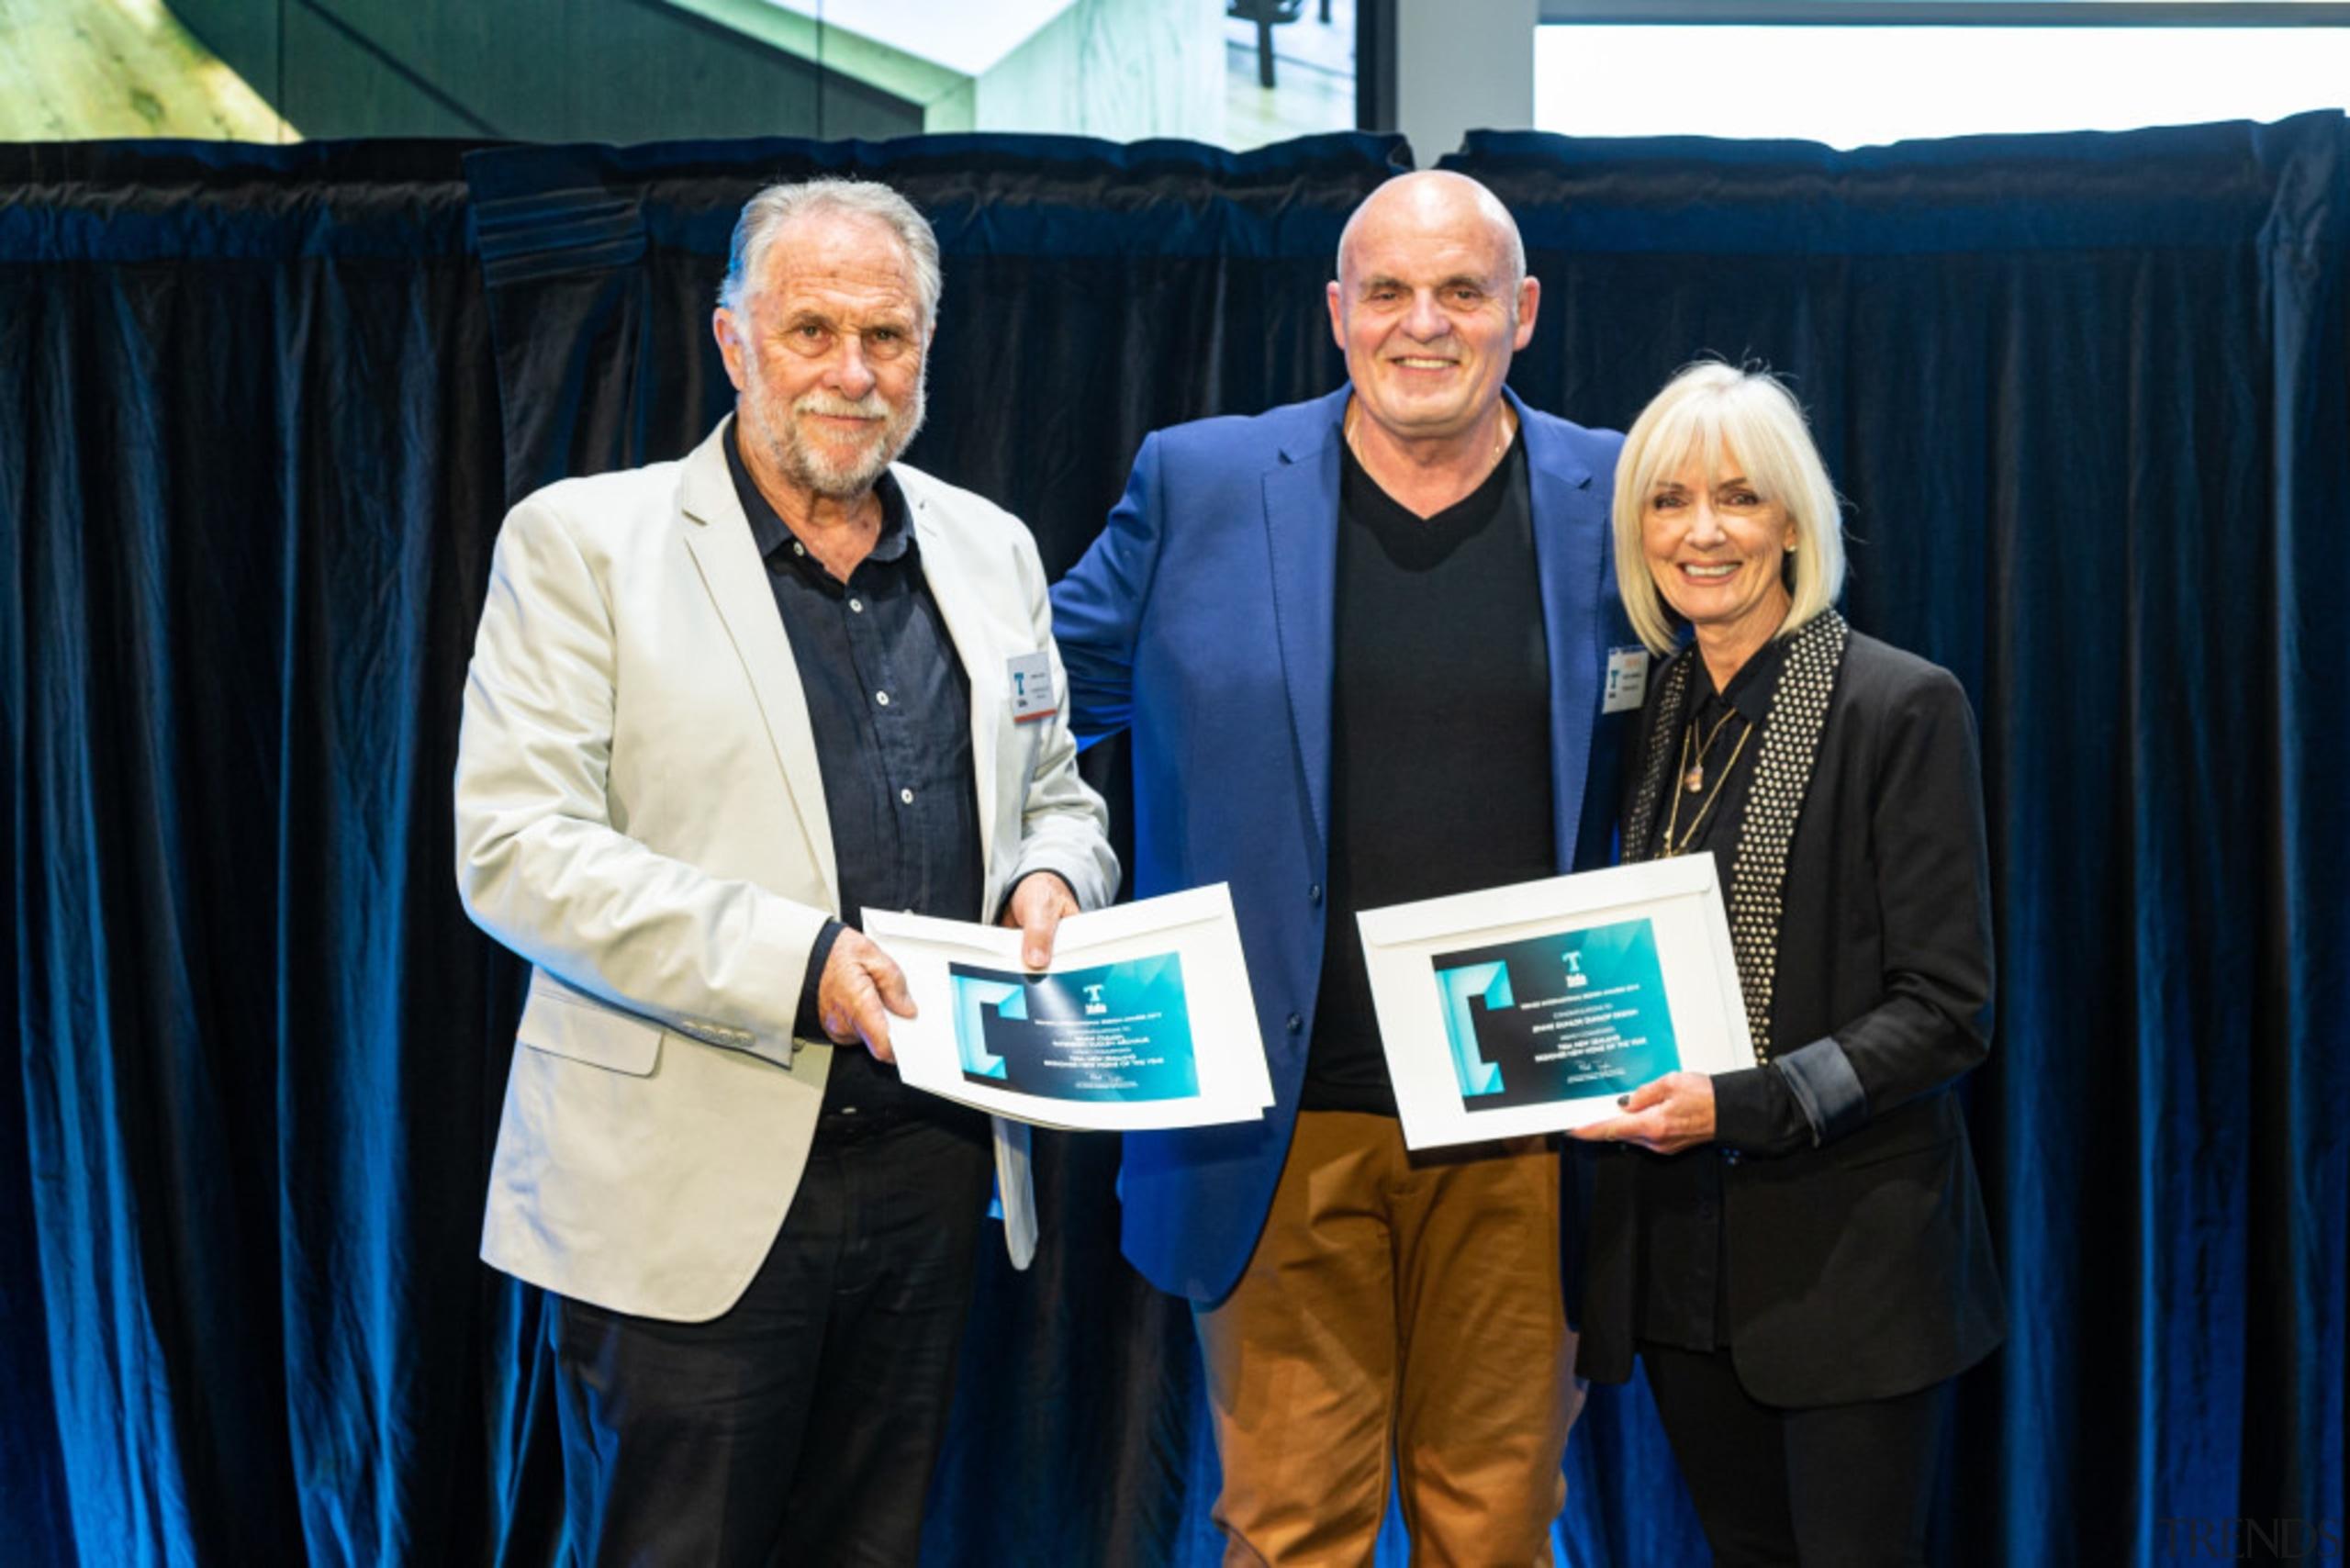 2019 TIDA New Zealand Homes presentation evening award, award ceremony, community, employment, event, job, black, blue